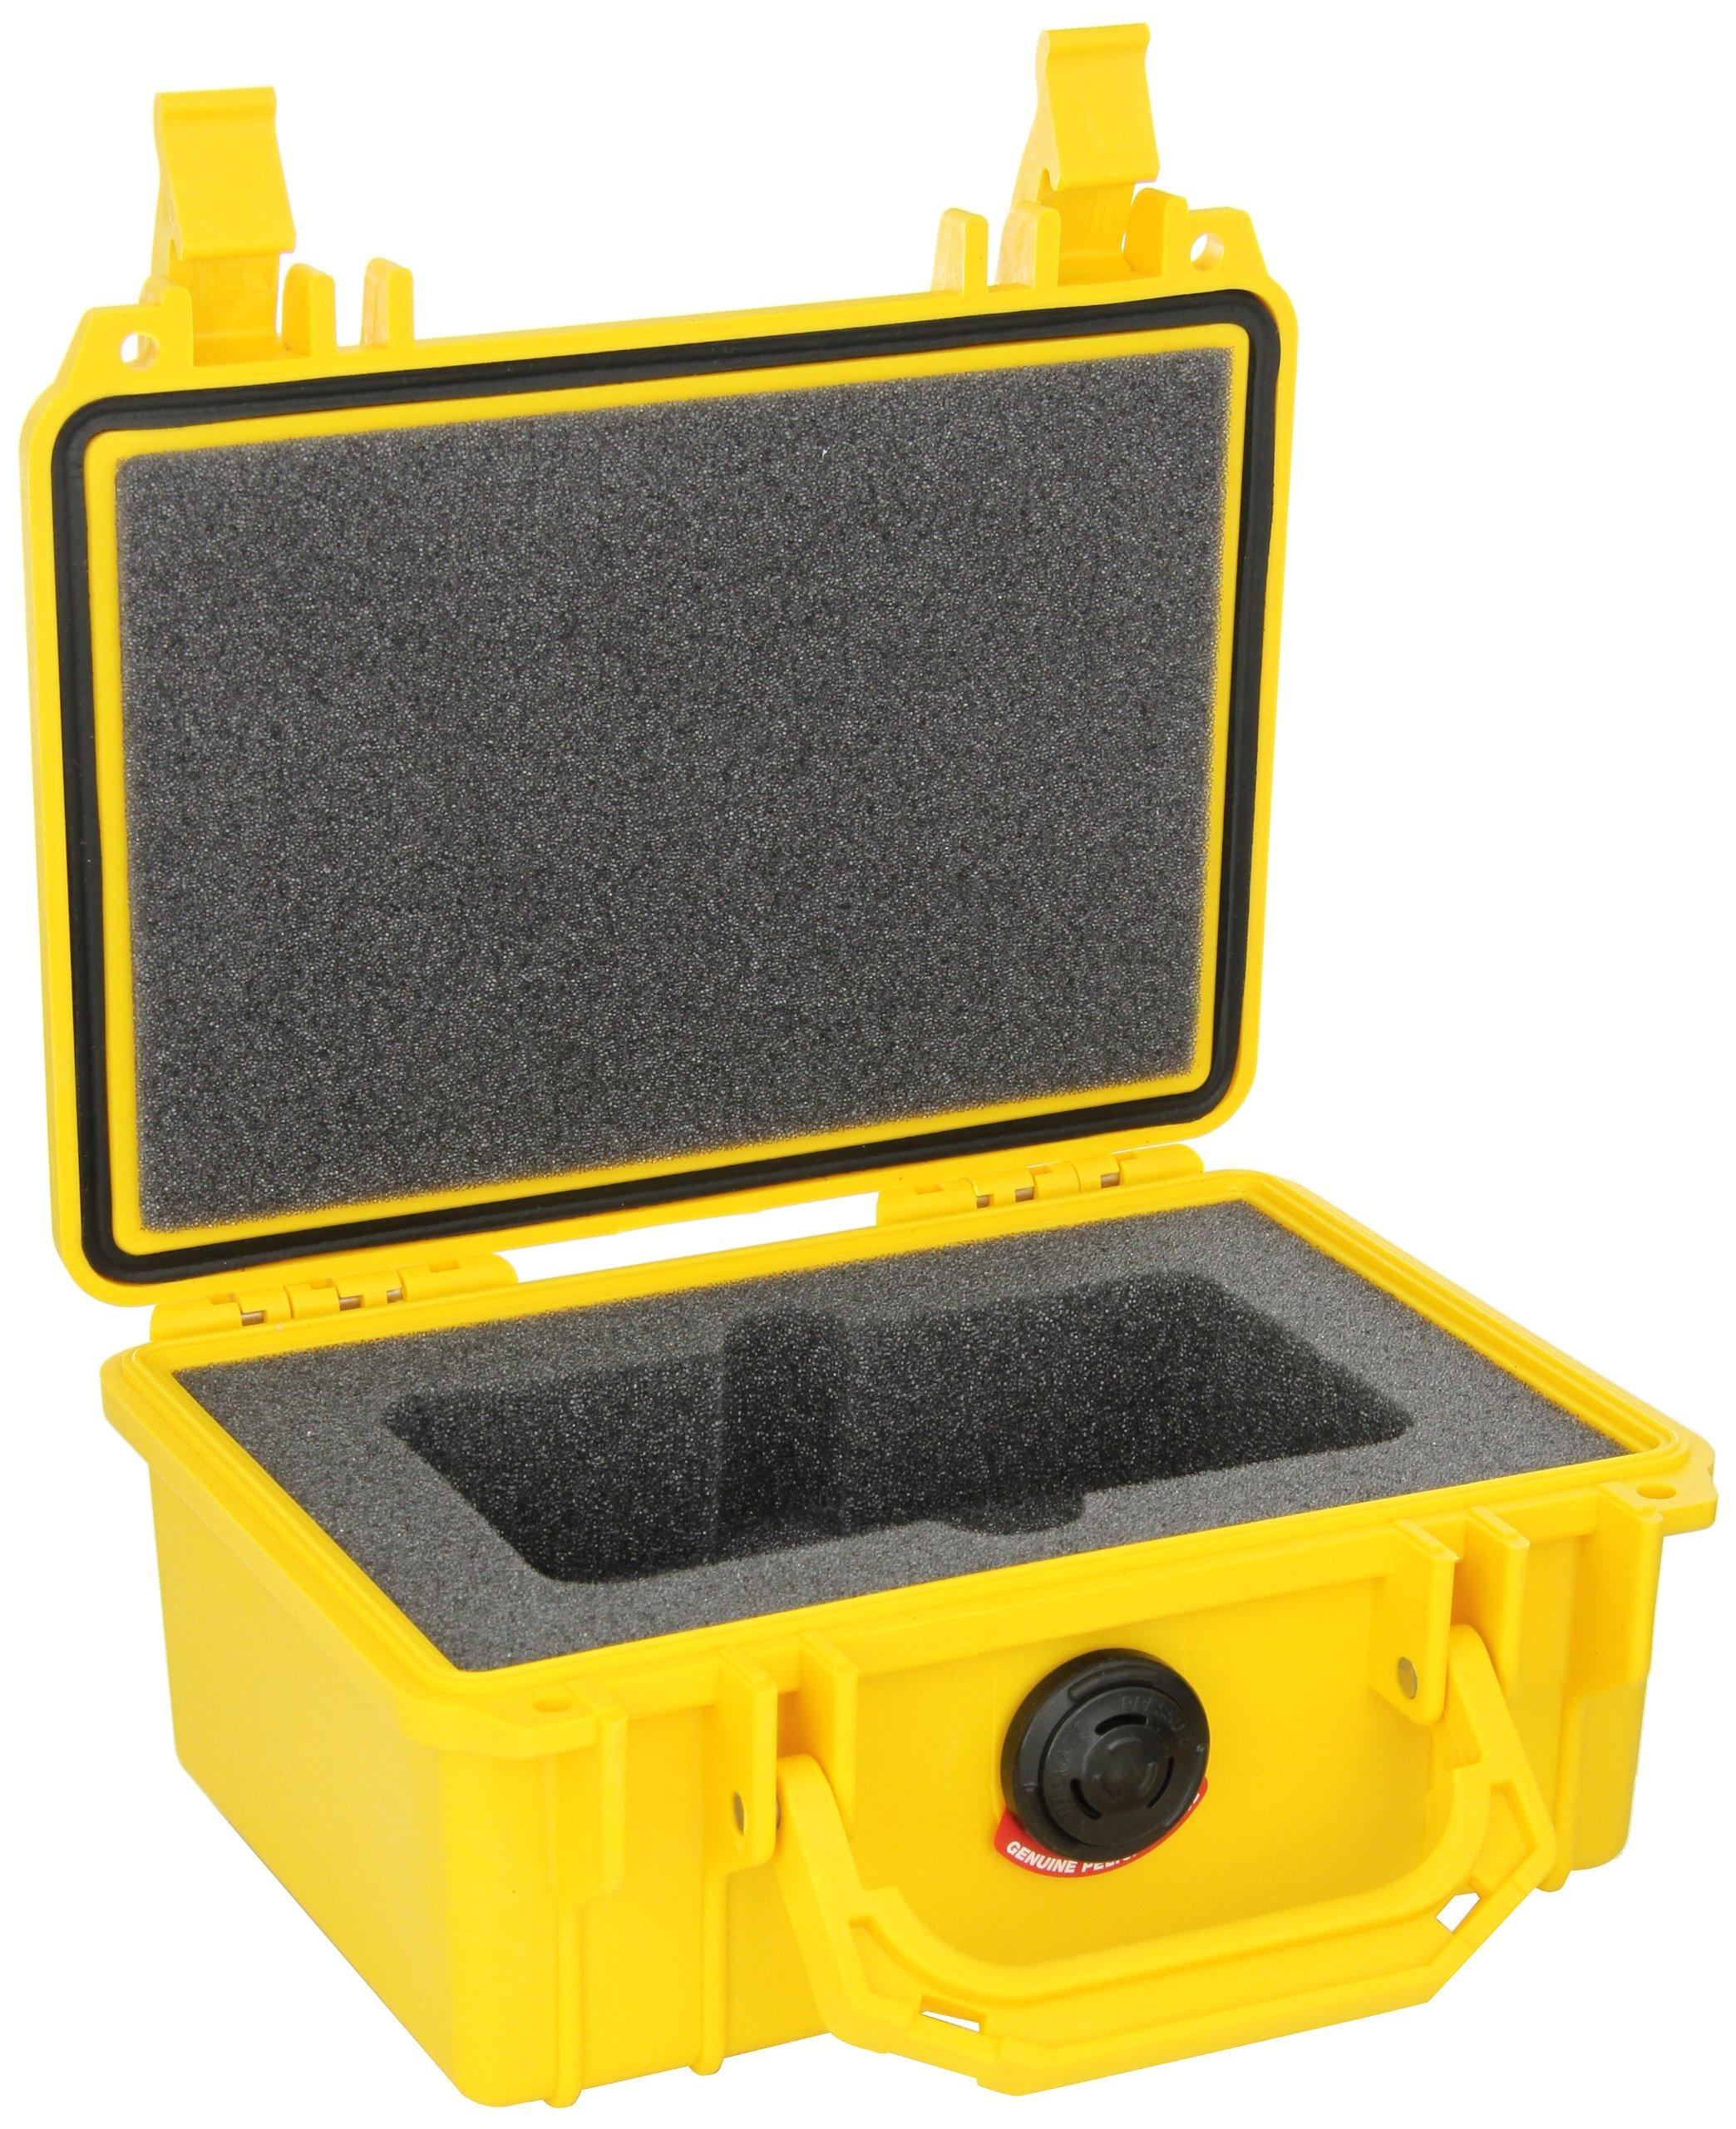 Mazur Instruments PRM-HC-YL Pelican PRM Hard Field Case, 7-1/4'' Length x 4-3/4'' Width, Yellow